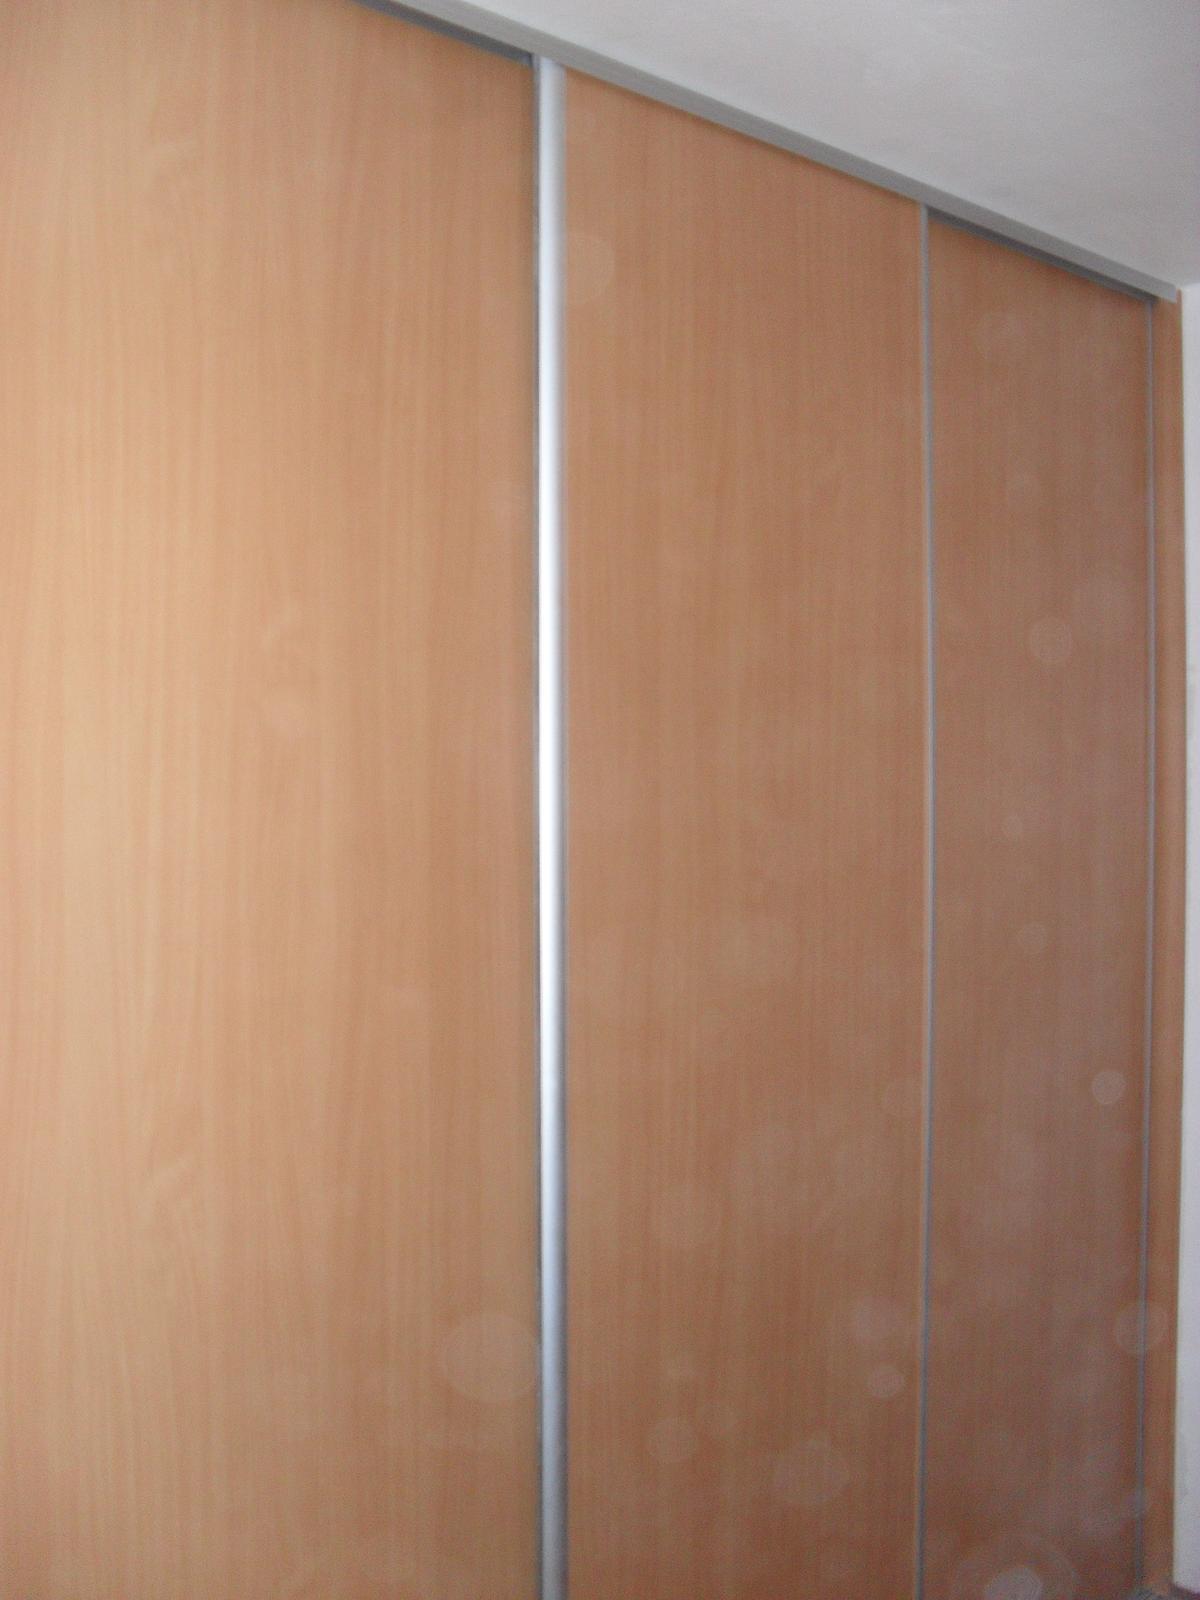 Vstavané skrine Martin Benko Bošany - Obrázok č. 124